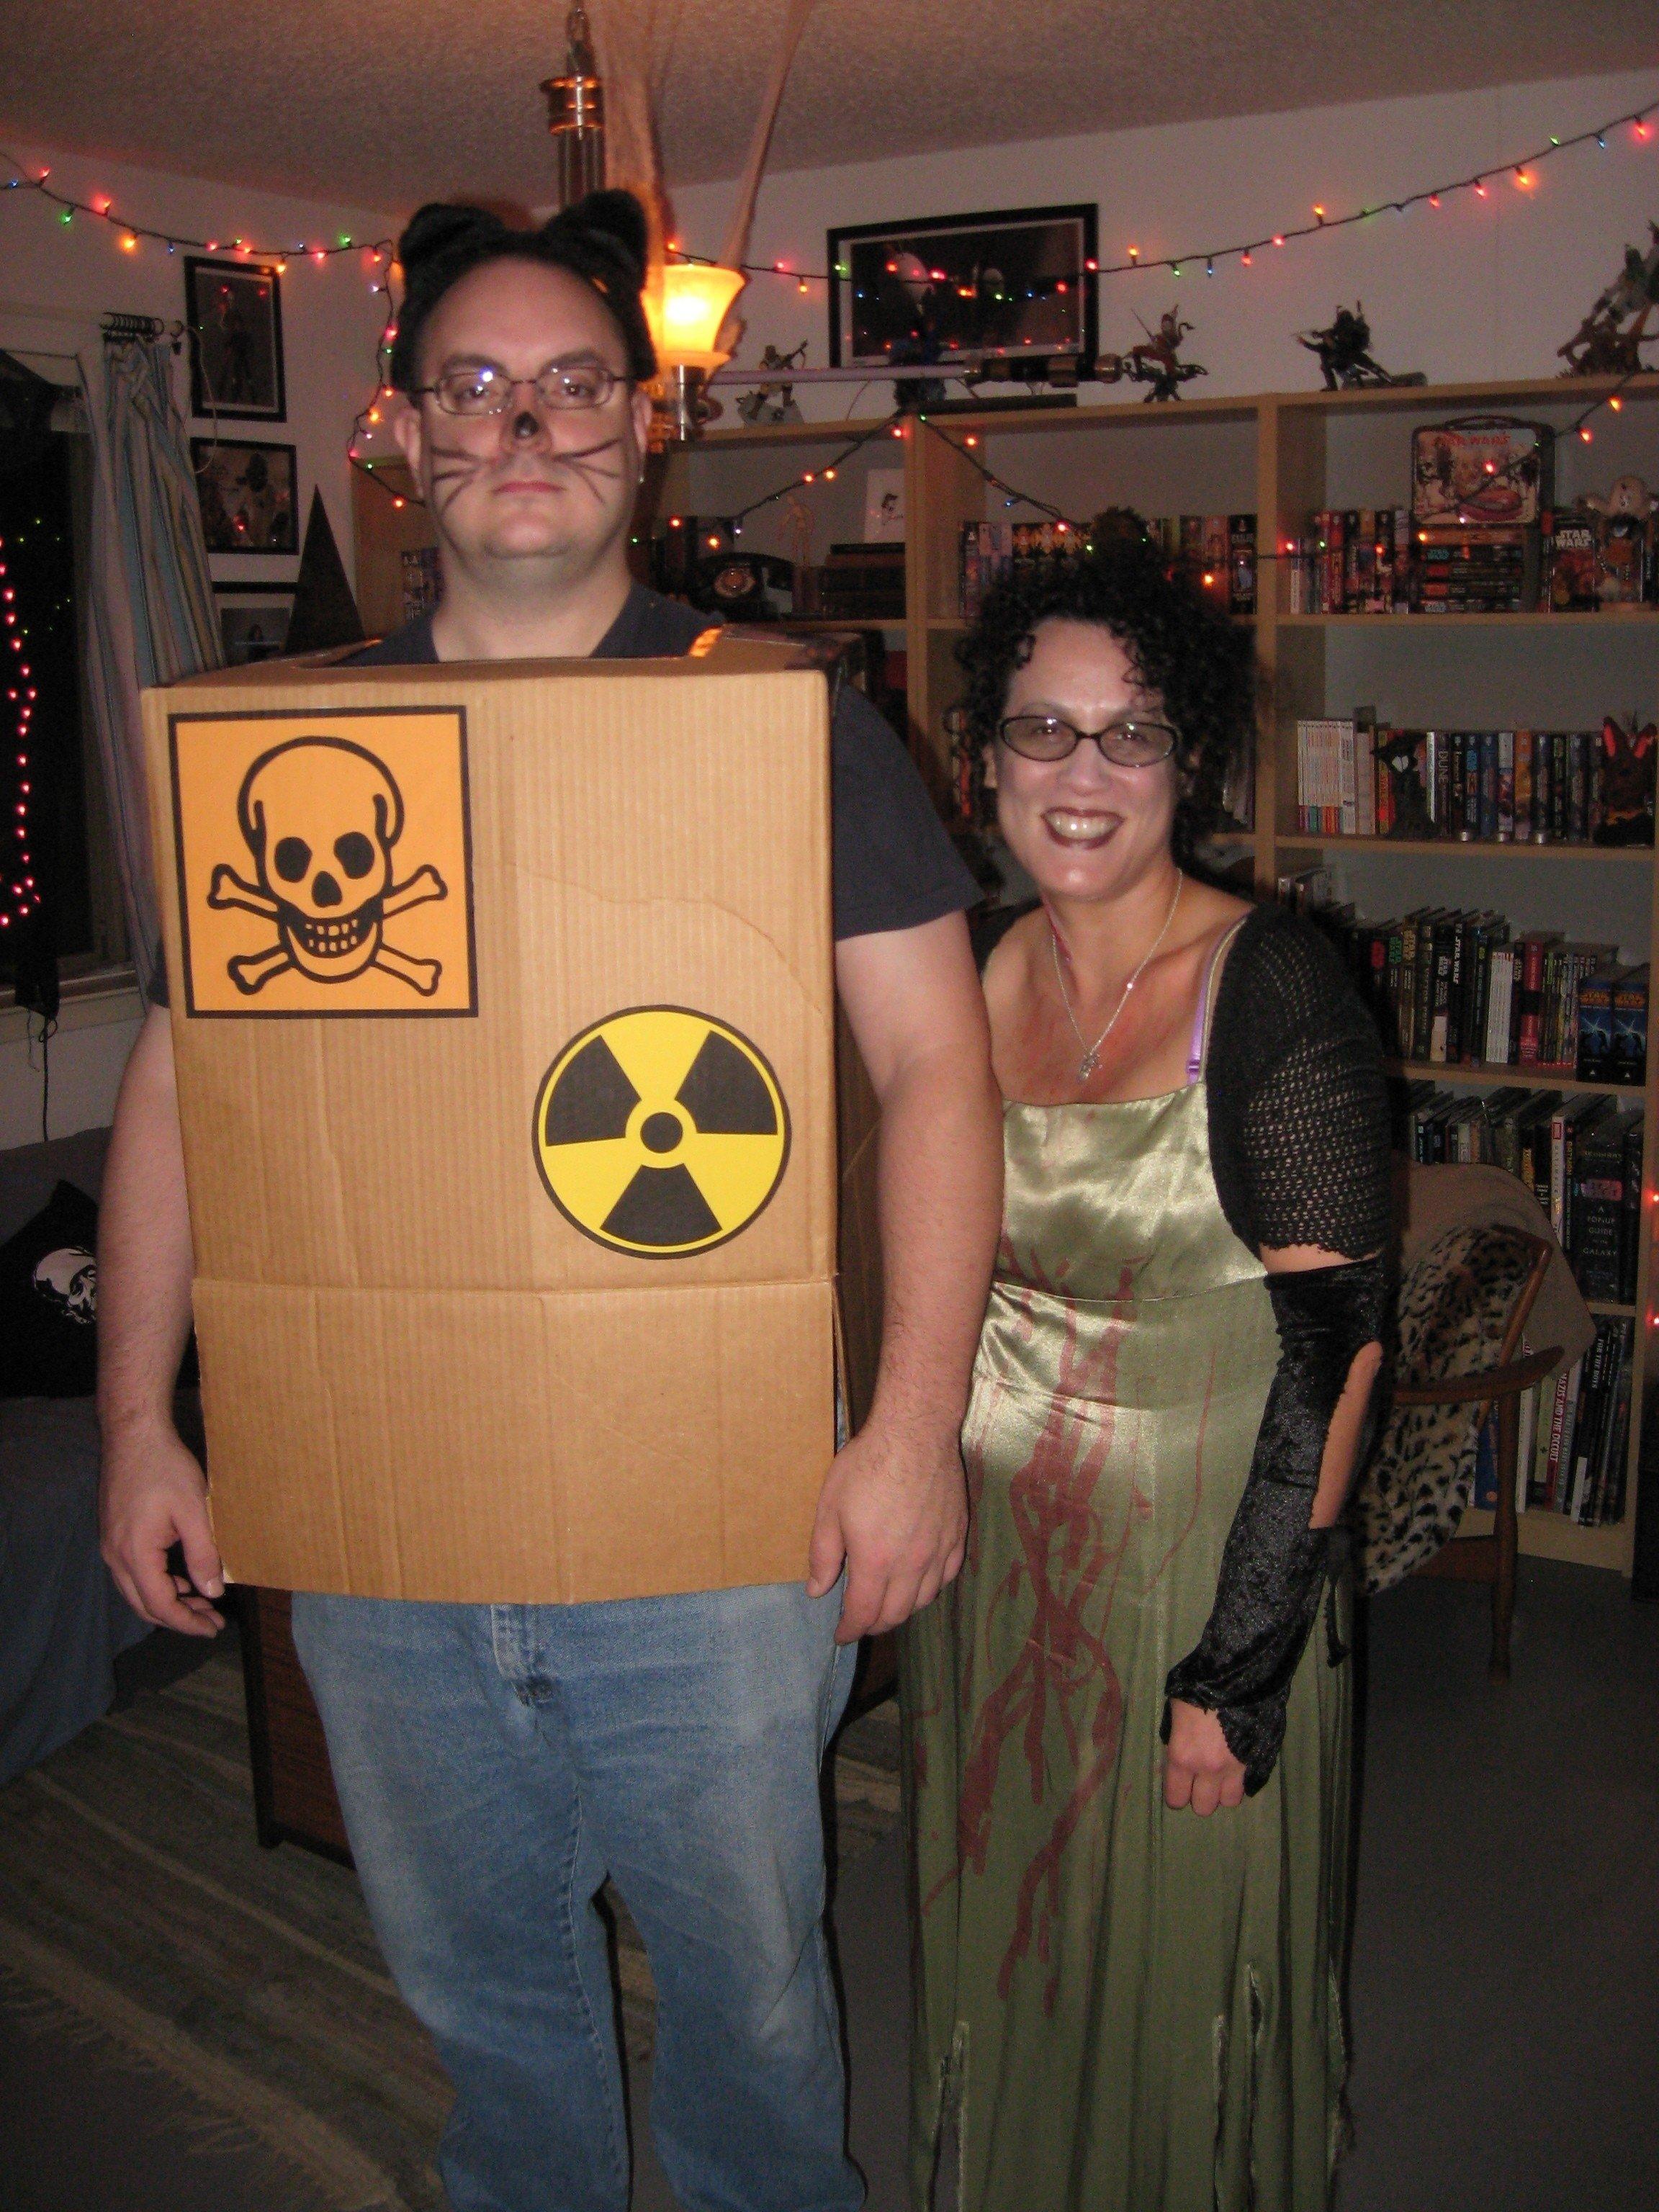 10 fantastic college halloween costume ideas guys good halloween costumes for college guys the halloween